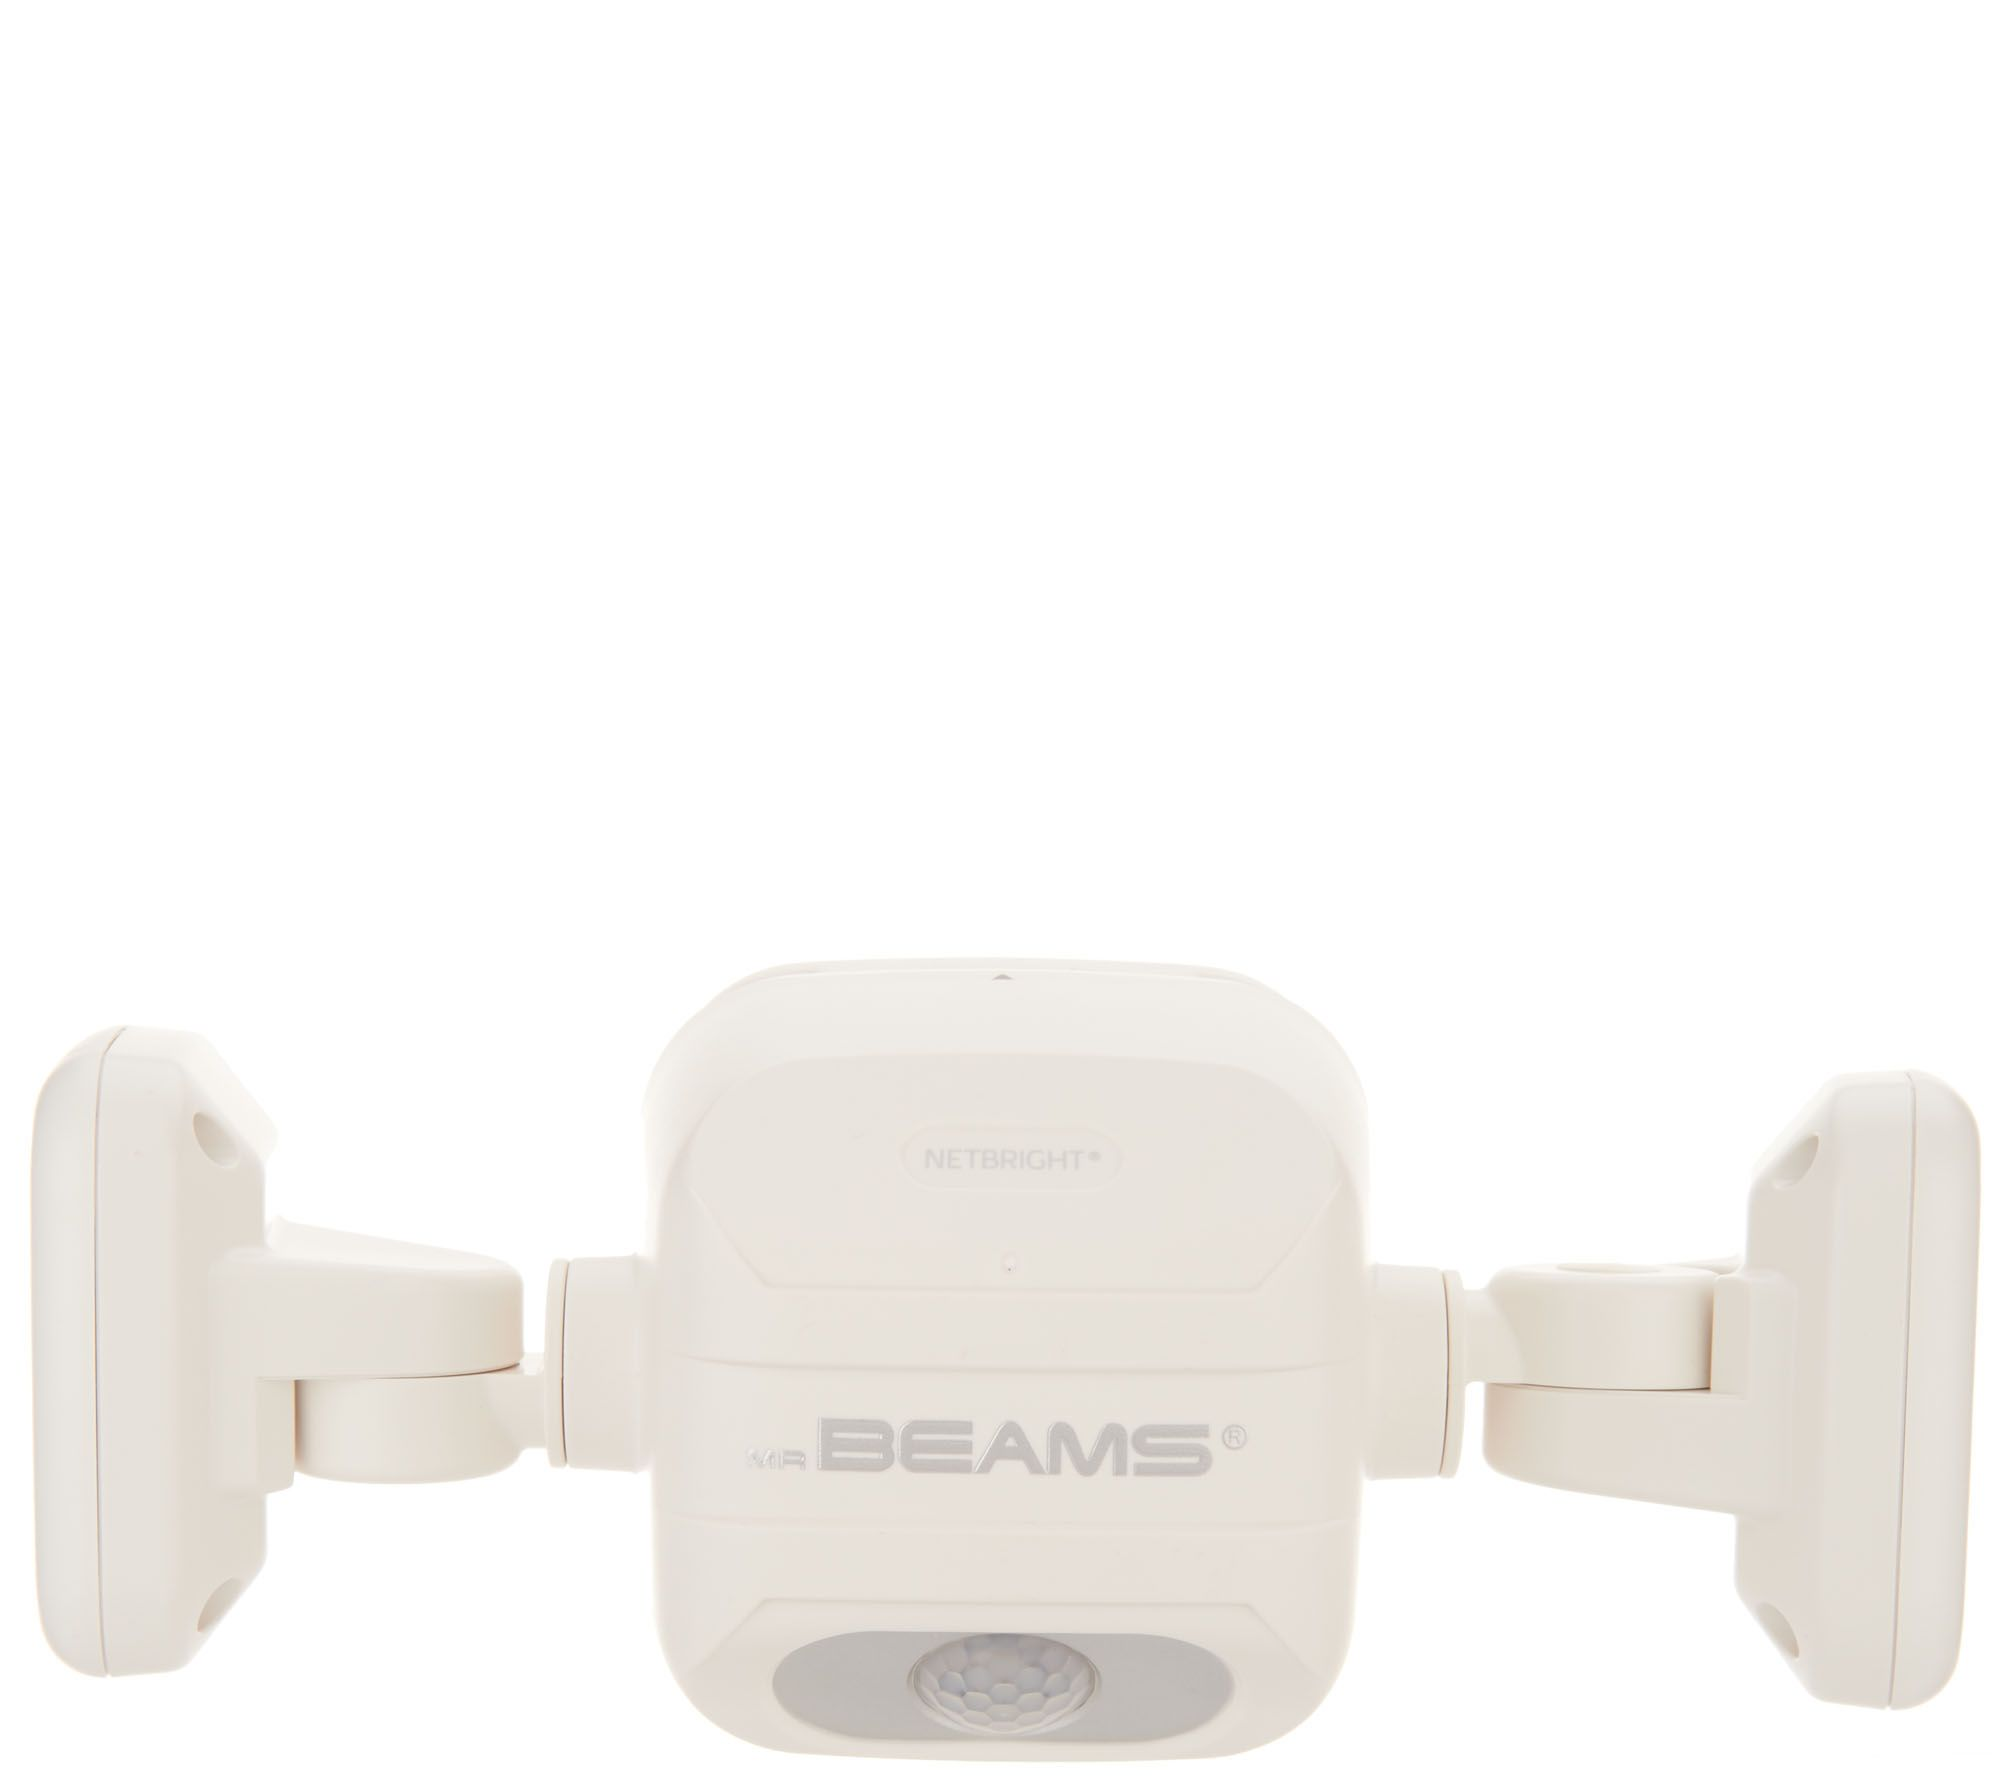 Mr Beams Netbright Dual Head Motion Sensor Security Light